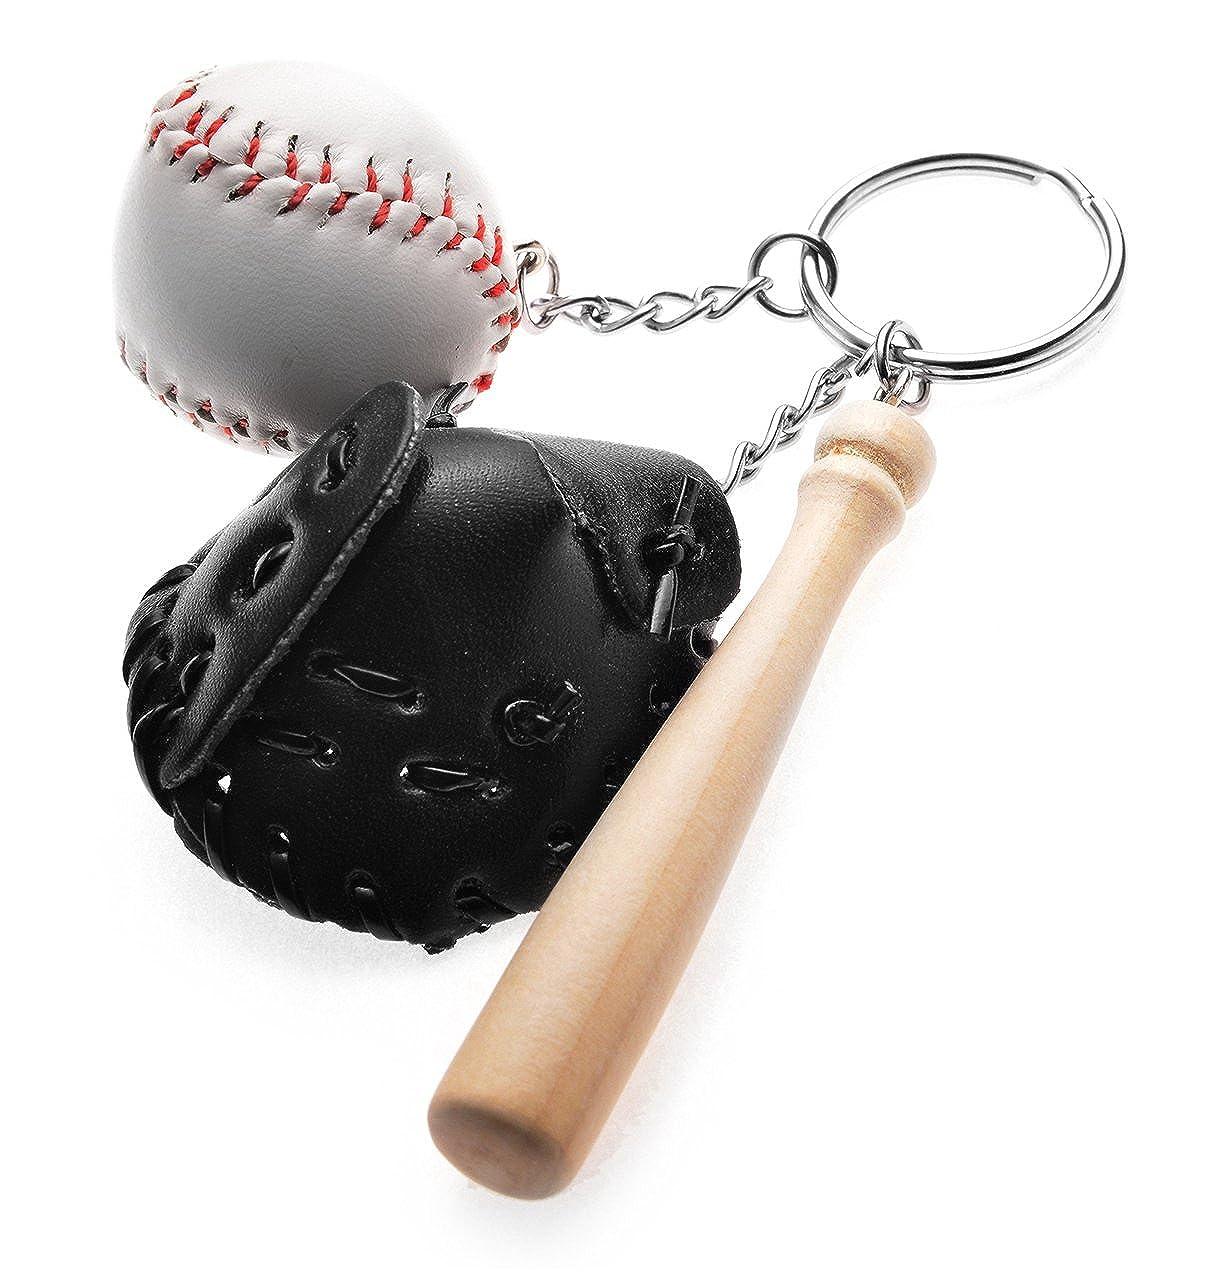 REINDEAR Novelty Baseball Bat Glove Set Pendant Keychain 758182507663